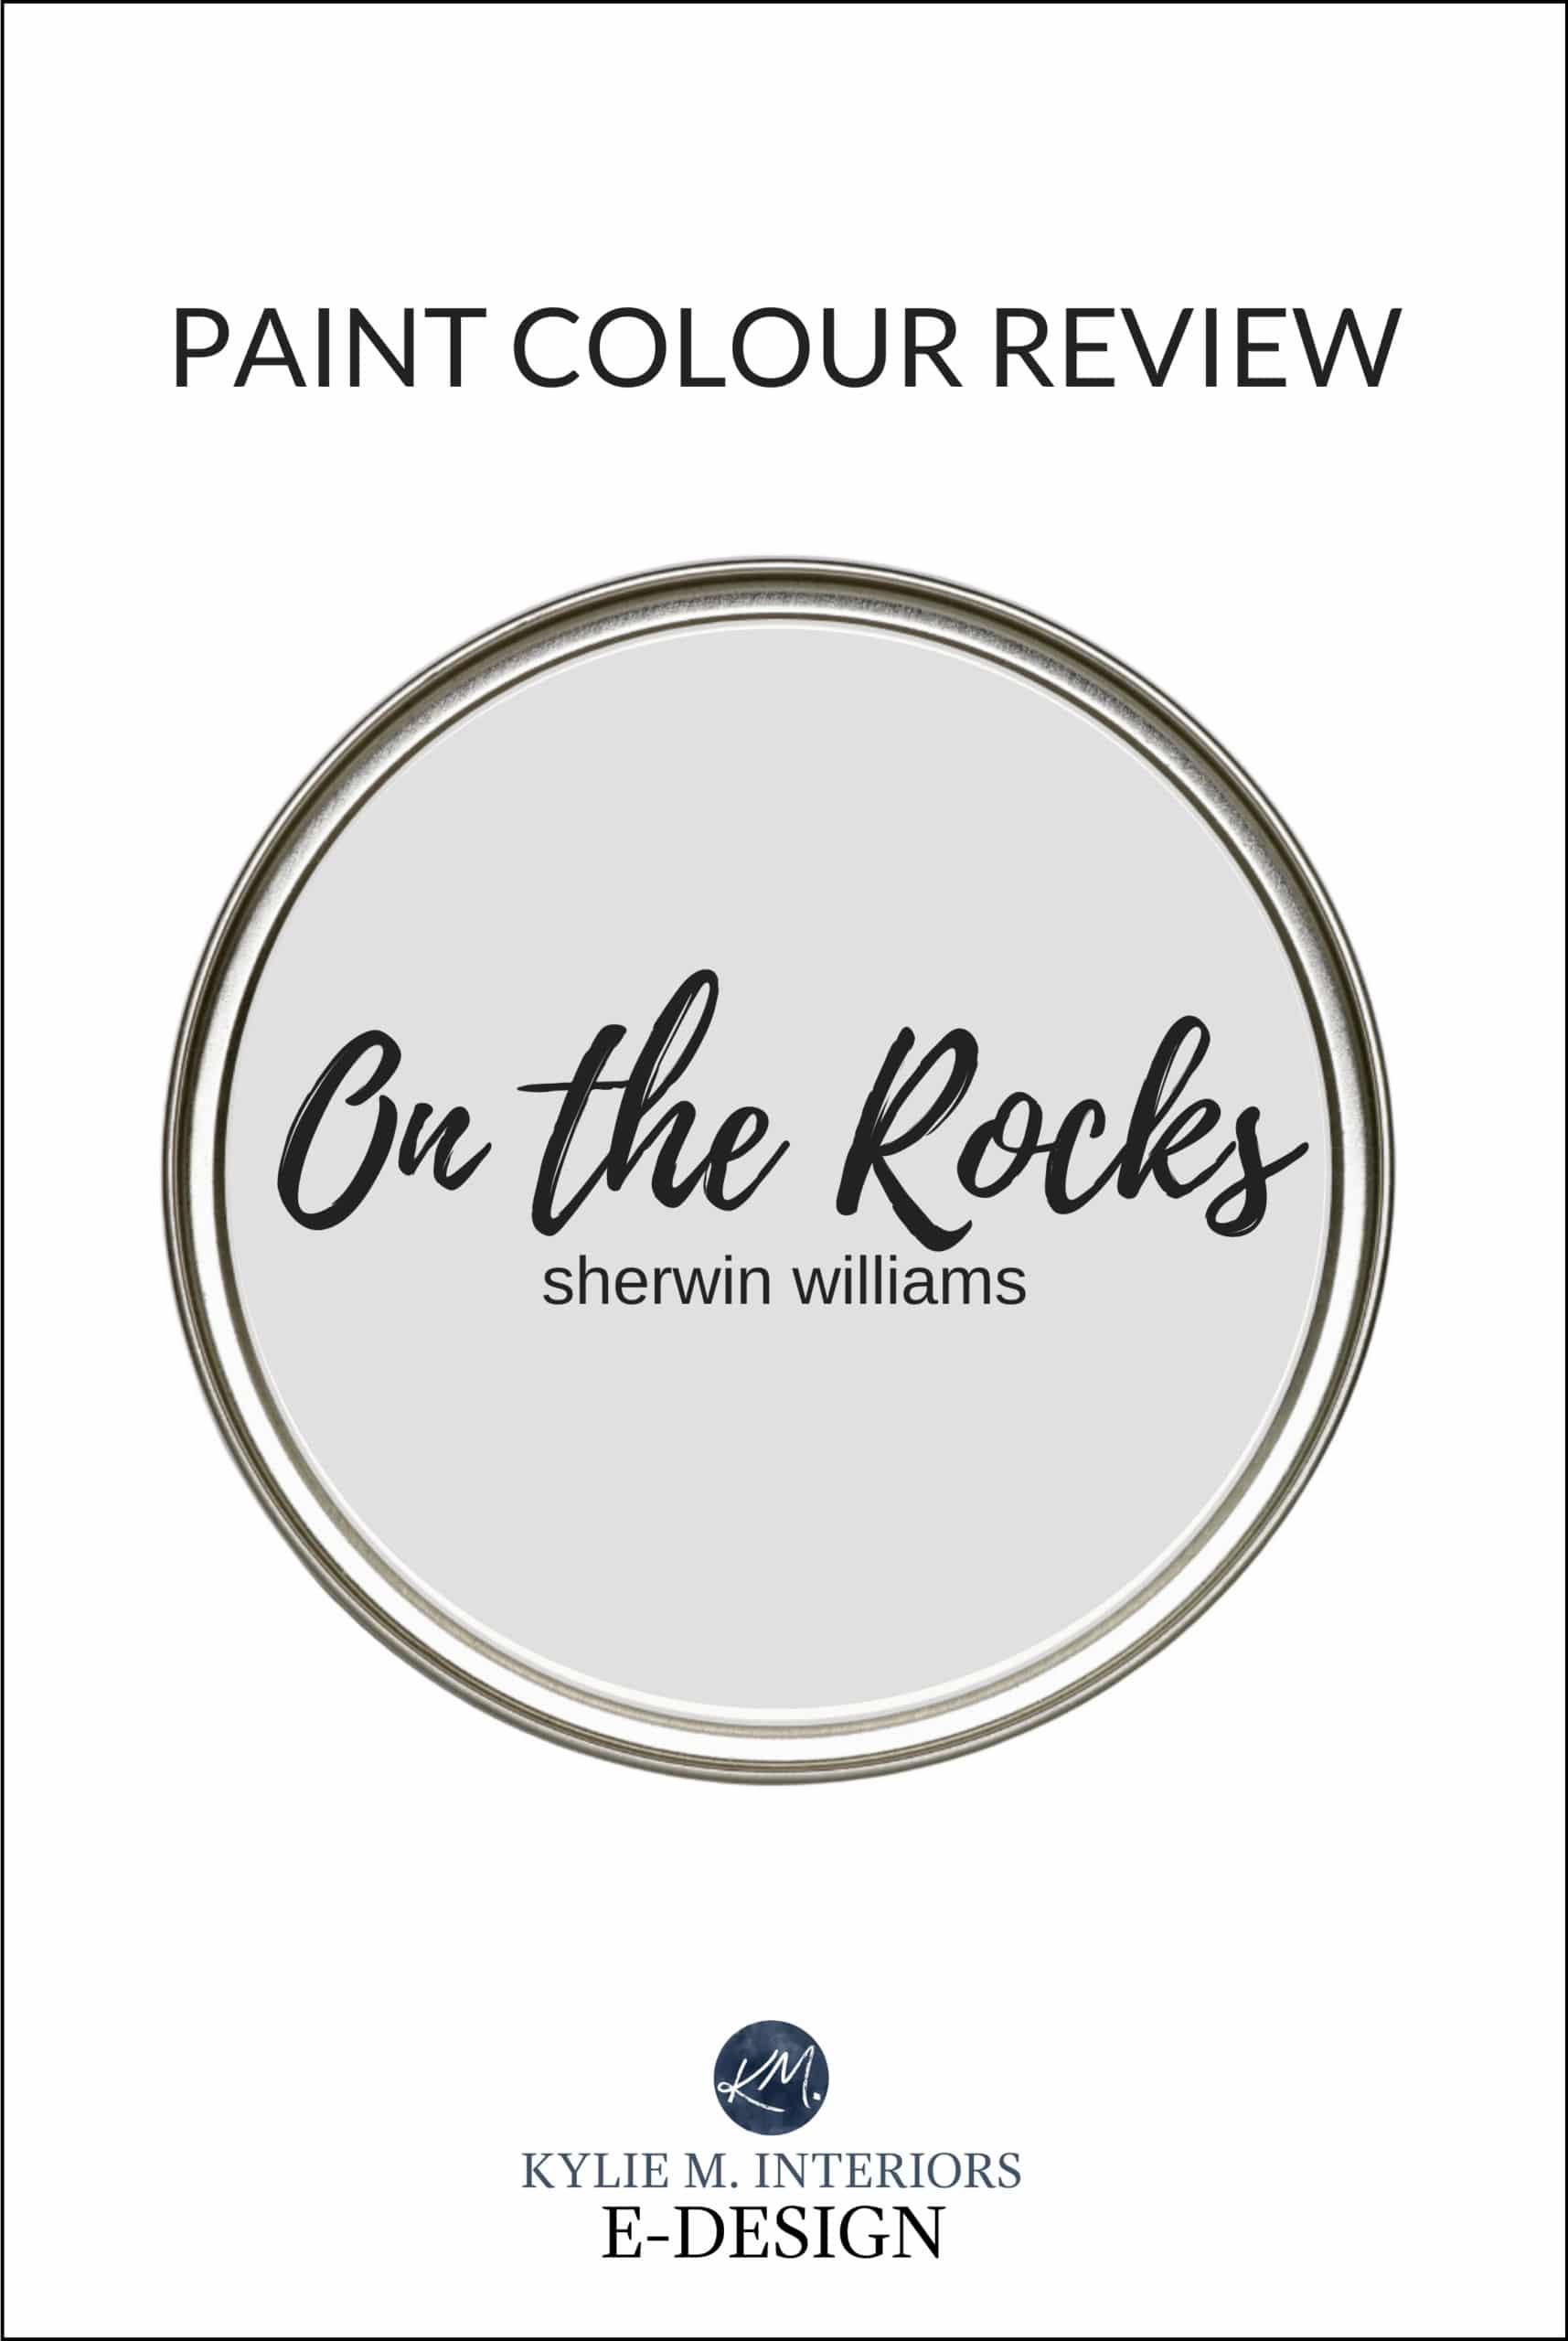 Kylie M Interiors Paint Colour review, best gray paint colour, Sherwin Williams on the Rocks.